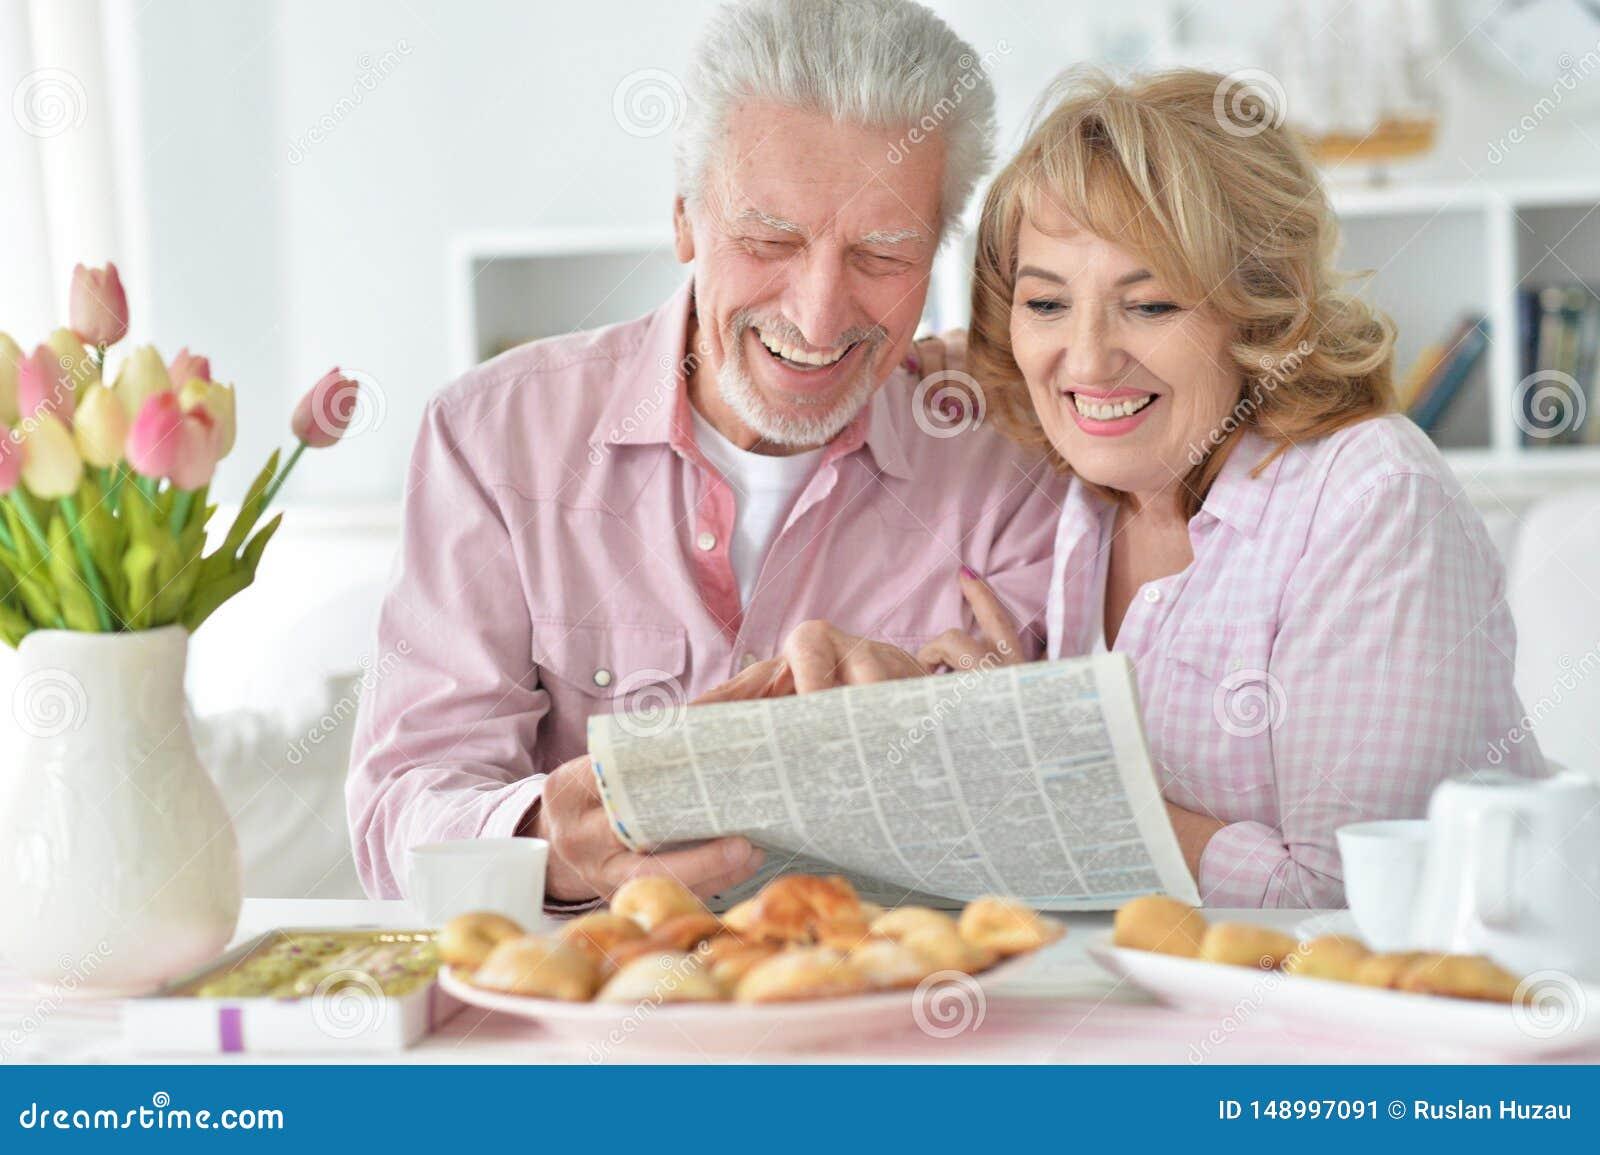 Most Legitimate Mature Online Dating Site No Membership